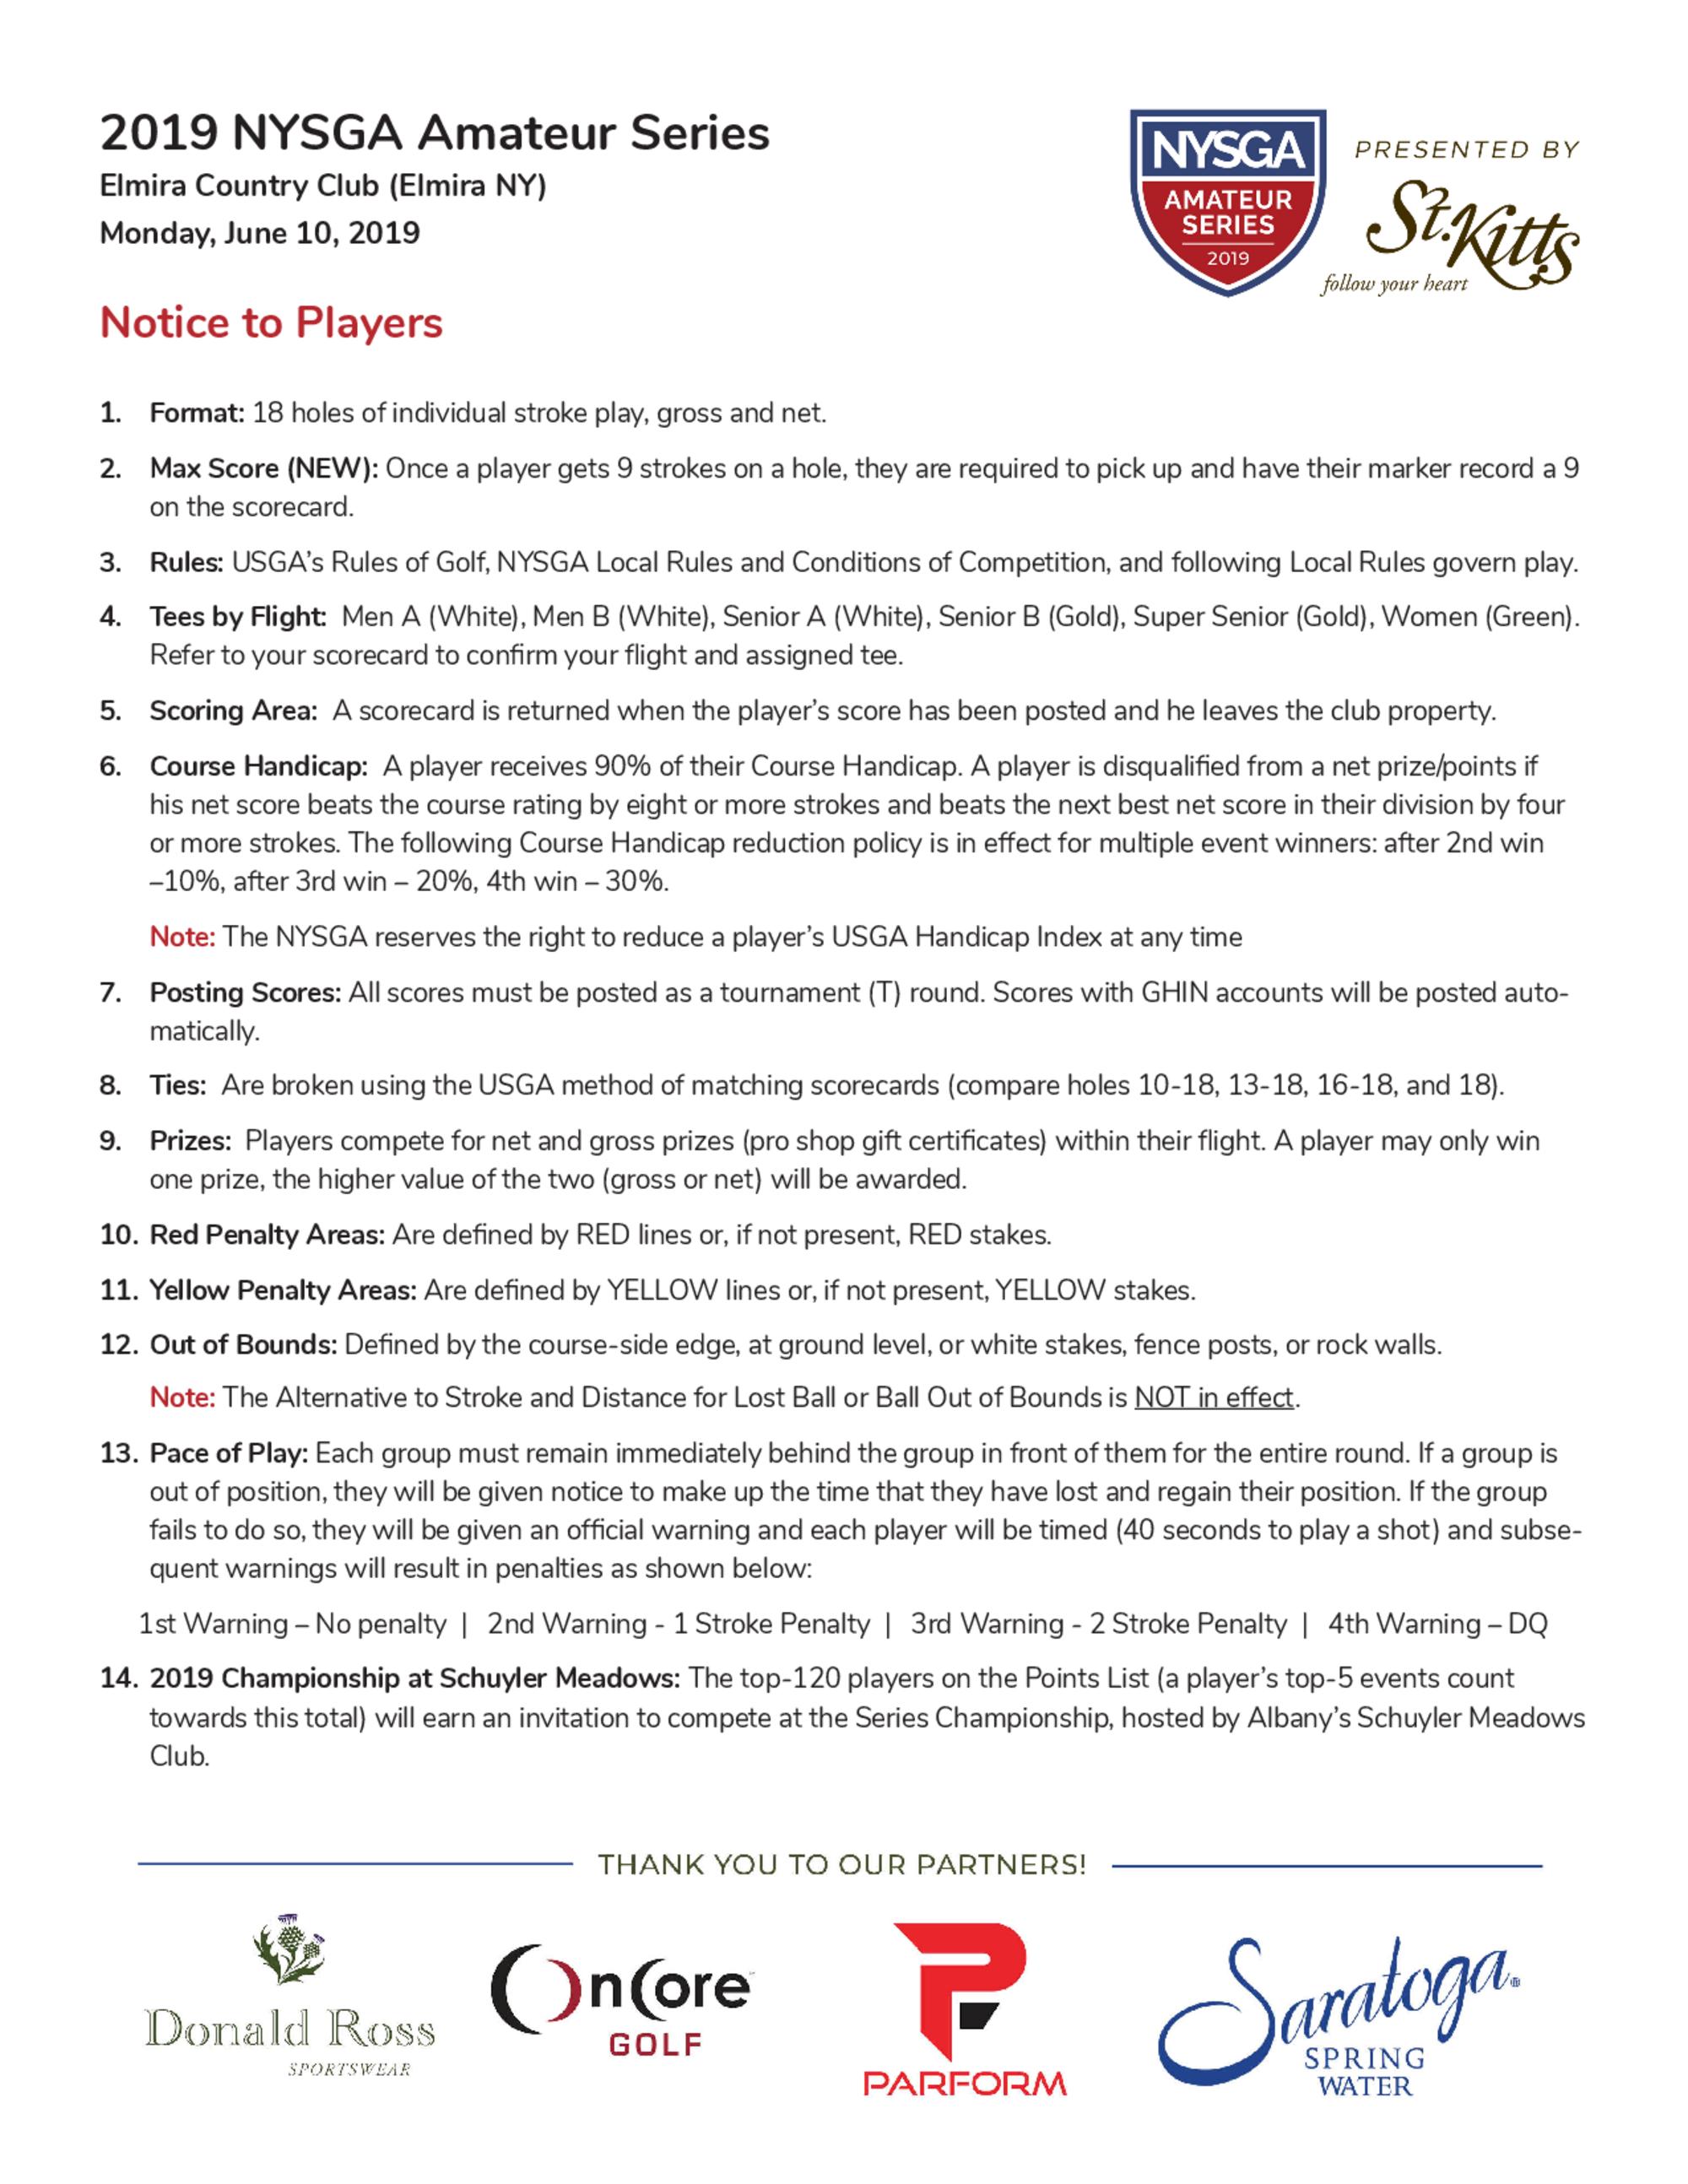 Elmira   notice to players 1